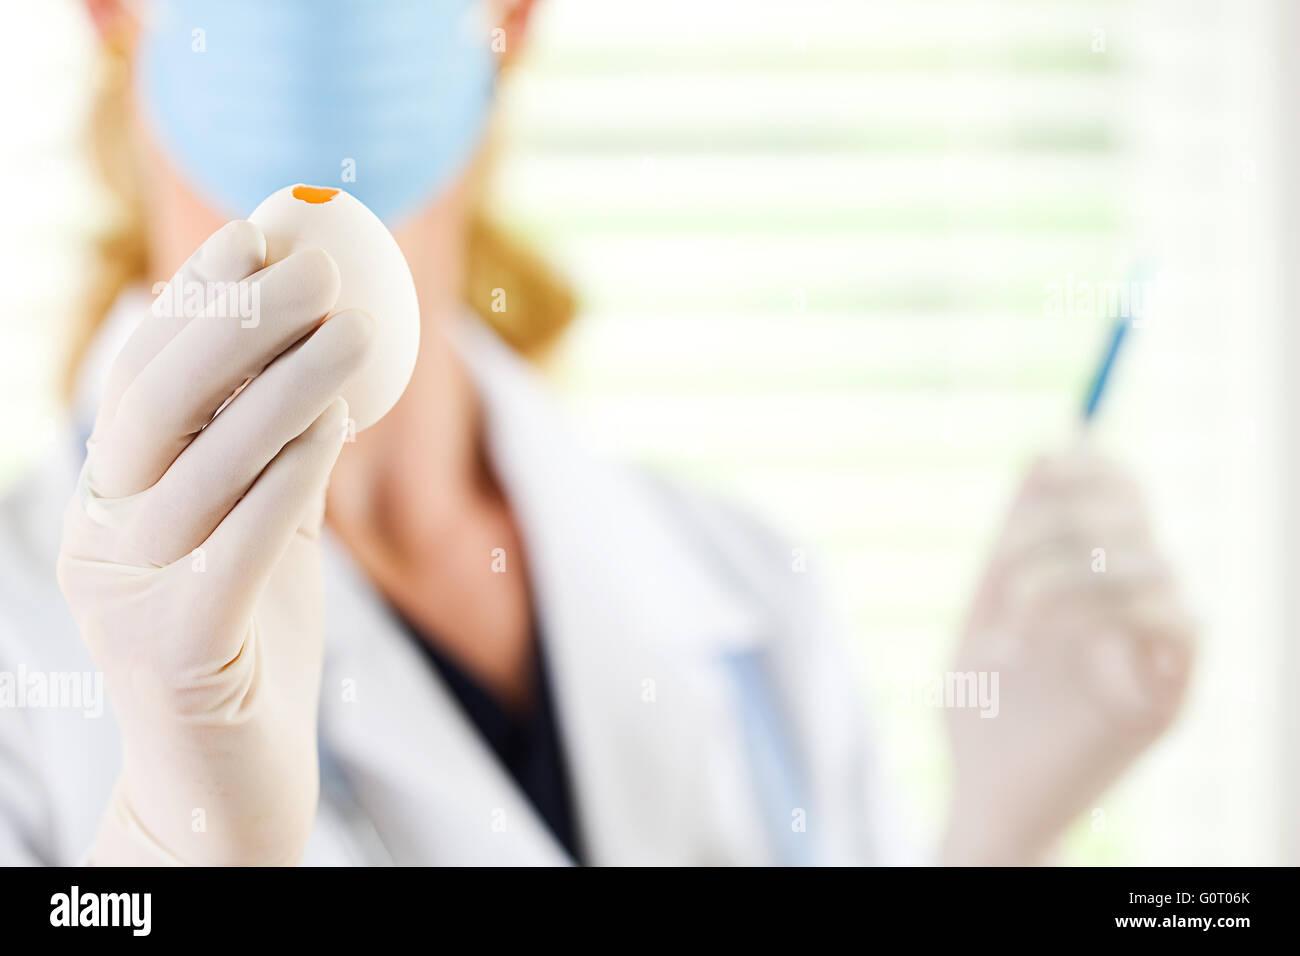 Female researcher/doctor inoculating flu virus into chicken eggs. - Stock Image